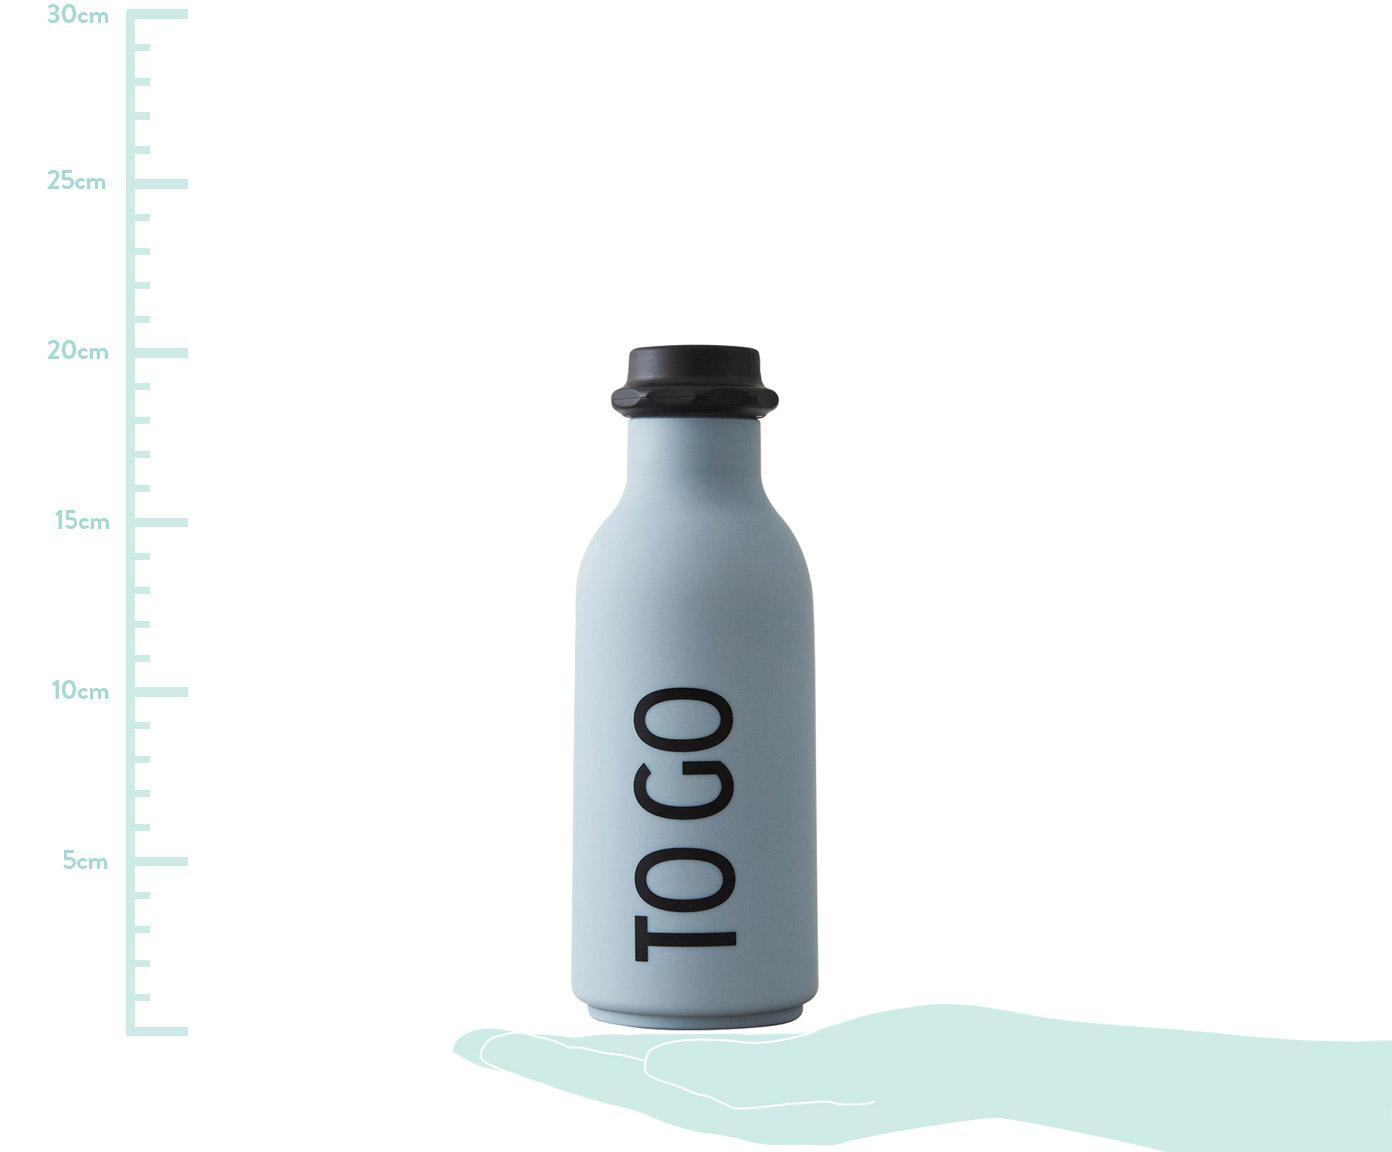 Drinkfles To Go, Fles: tritan (kunststof), BPA-v, Deksel: polypropyleen, Mat lichtblauw, zwart, Ø 8 x H 20 cm